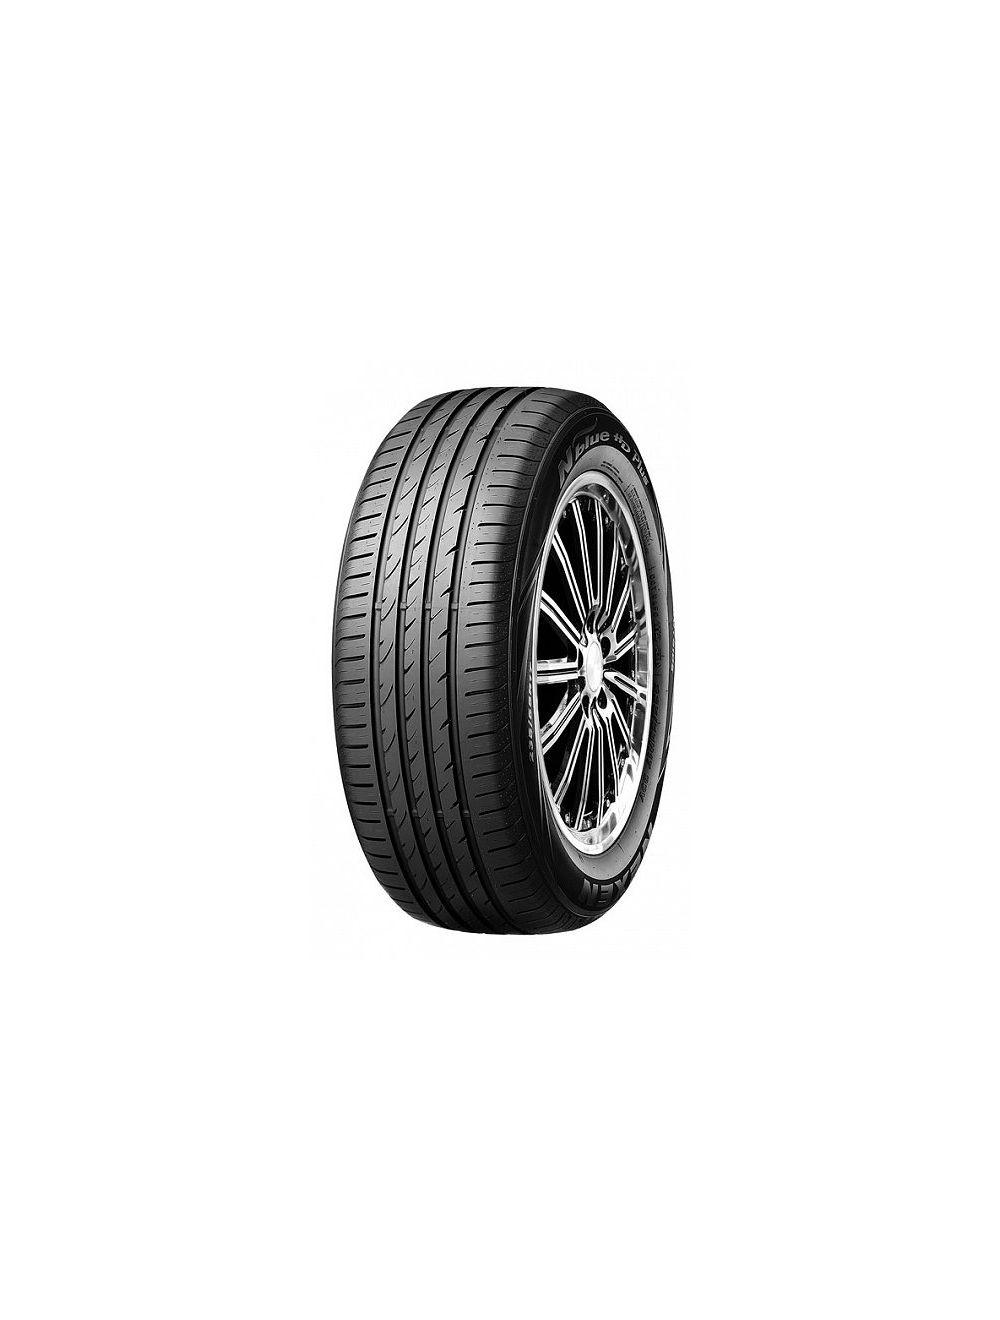 Nexen 165/70R14 T N-Blue HD Plus XL Nyári gumi